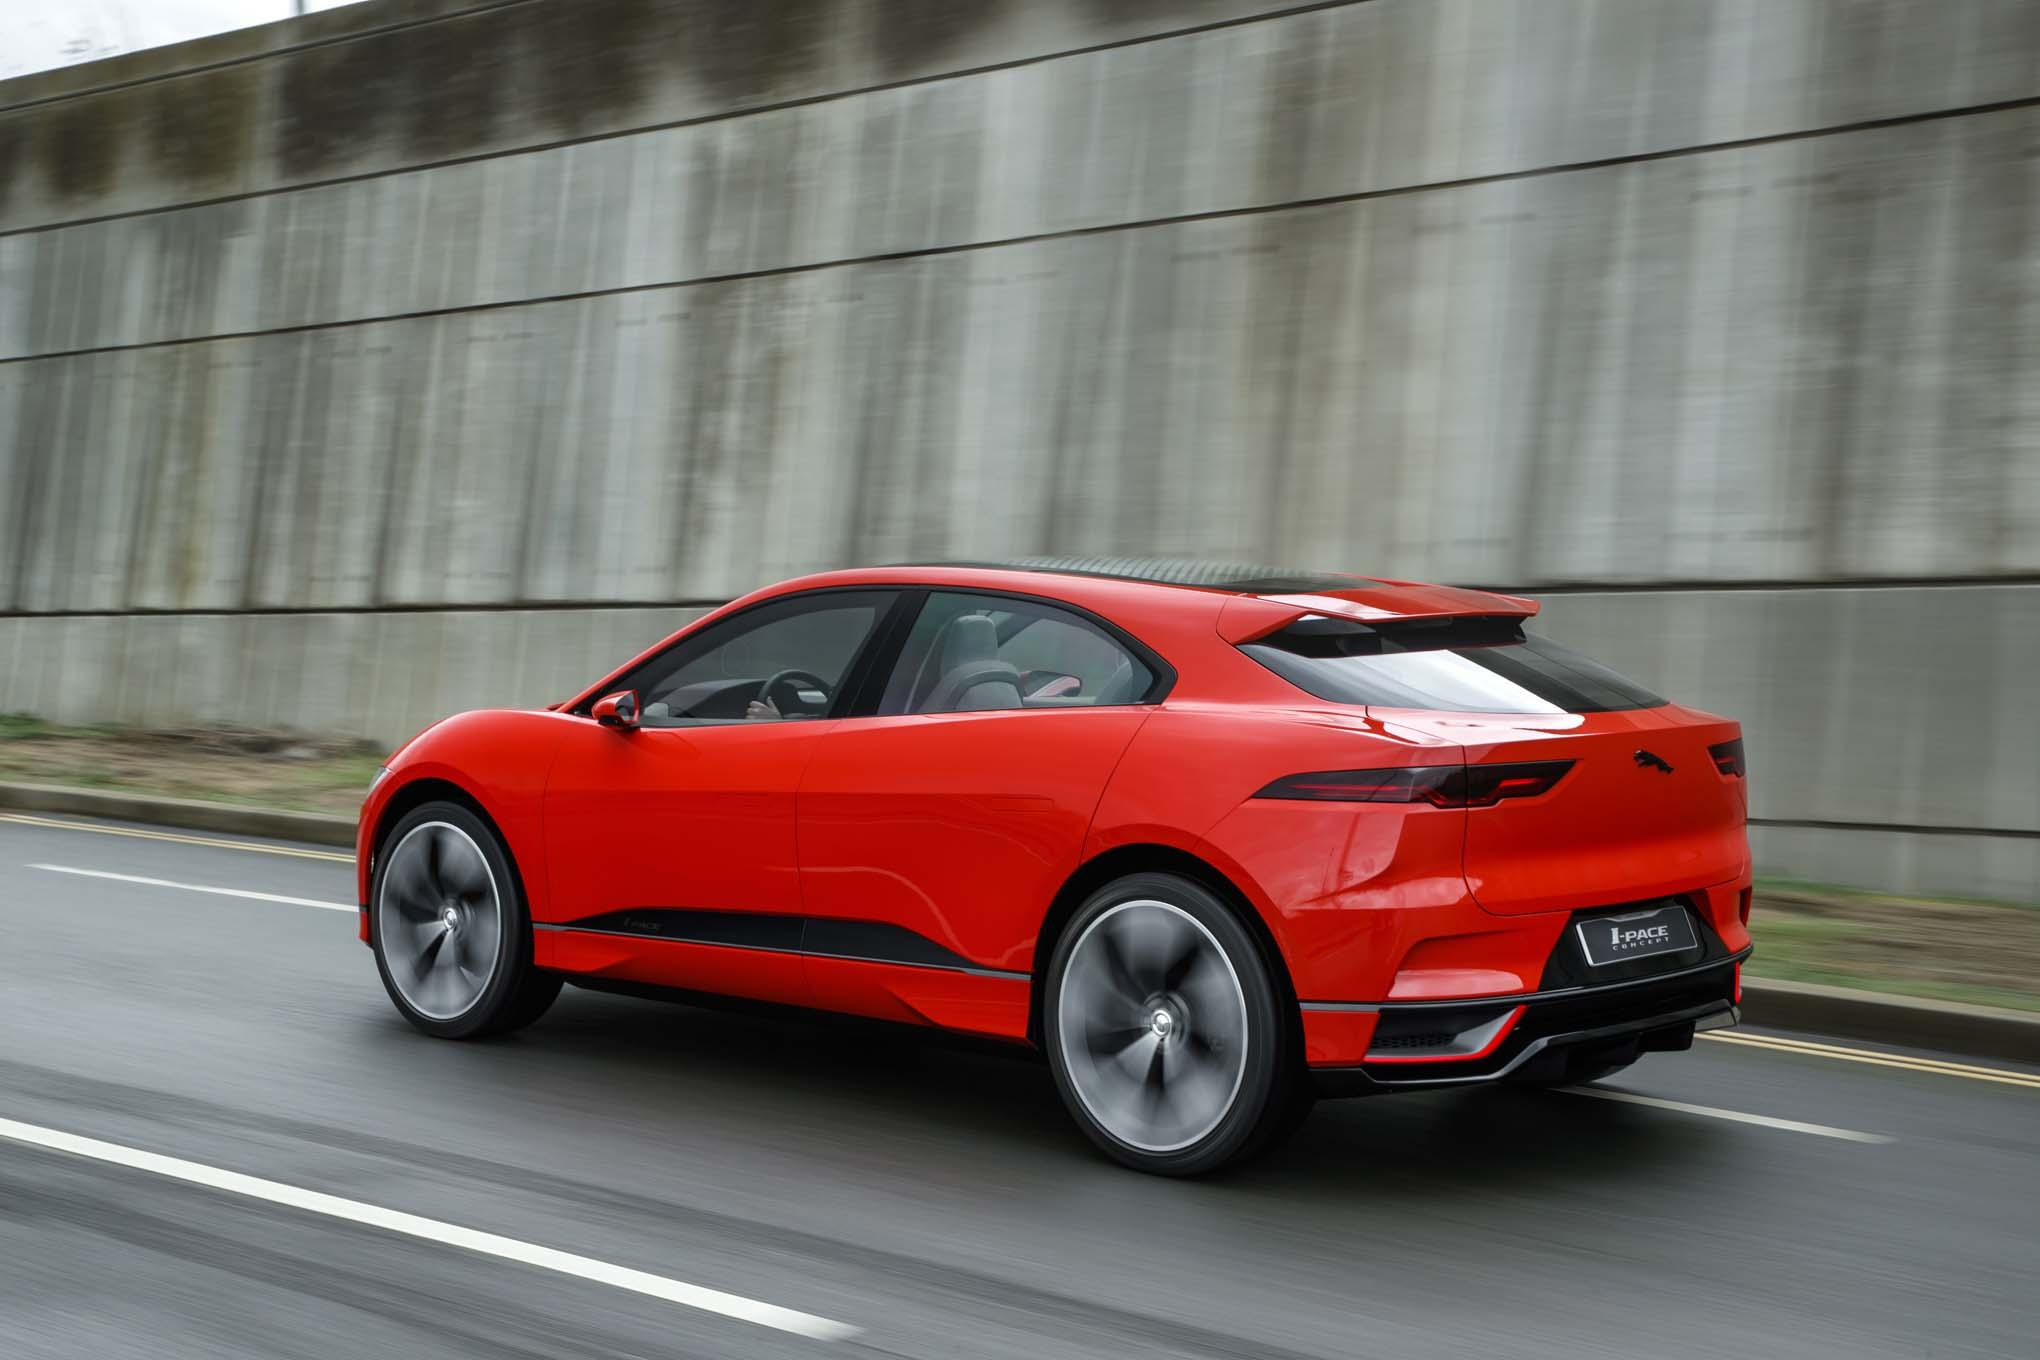 jaguar teases new e